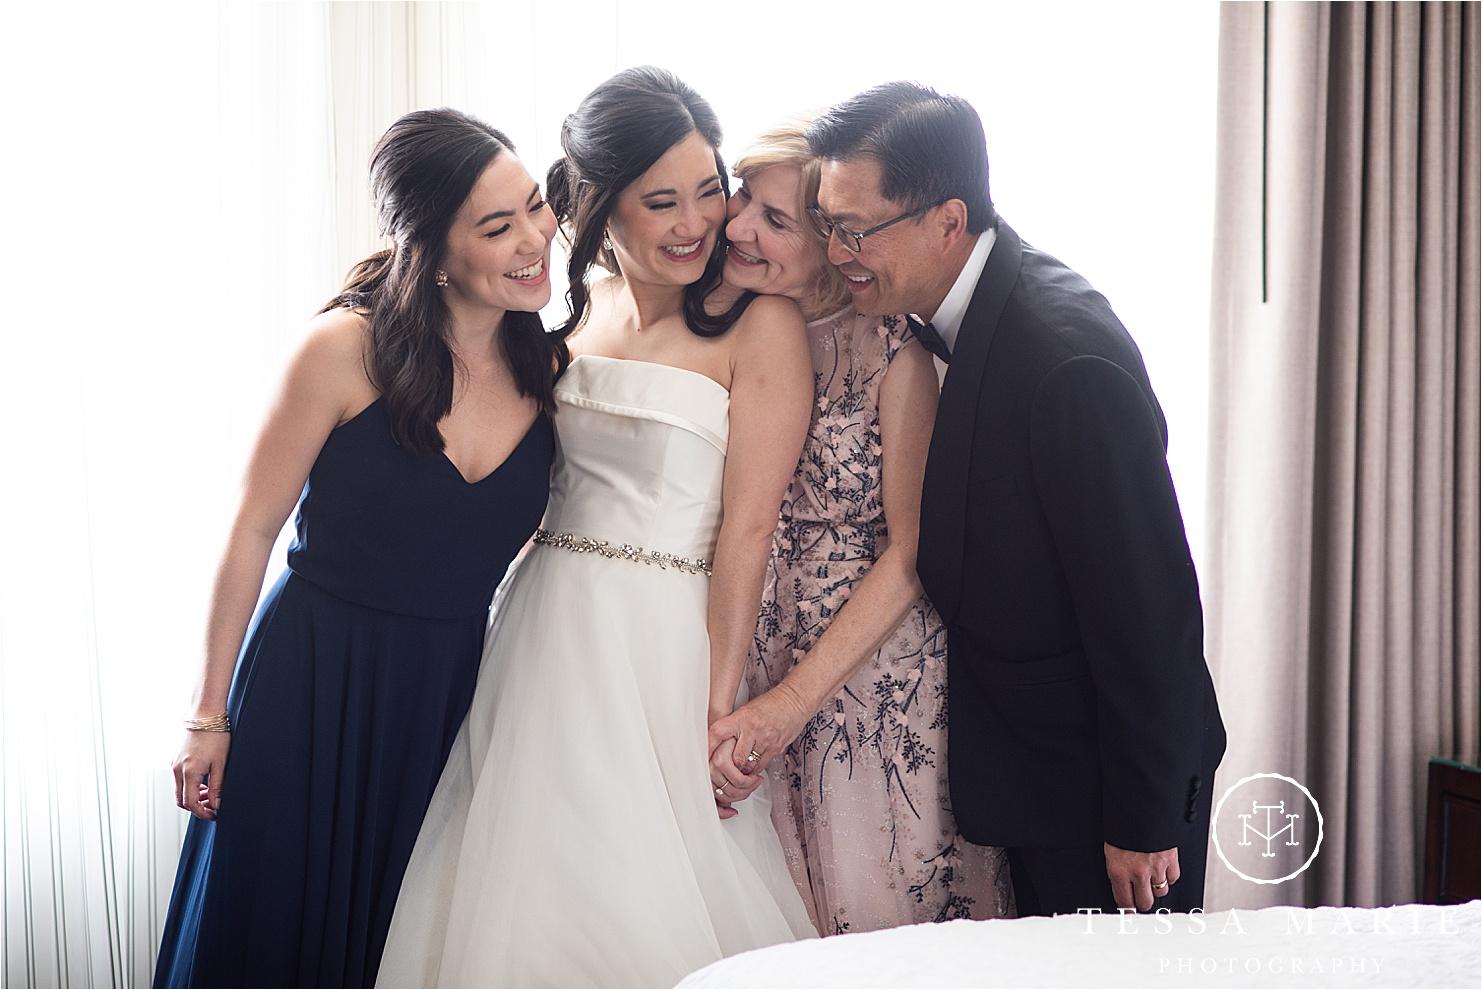 Tessa_marie_weddings_houston_wedding_photographer_The_astorian_0025.jpg